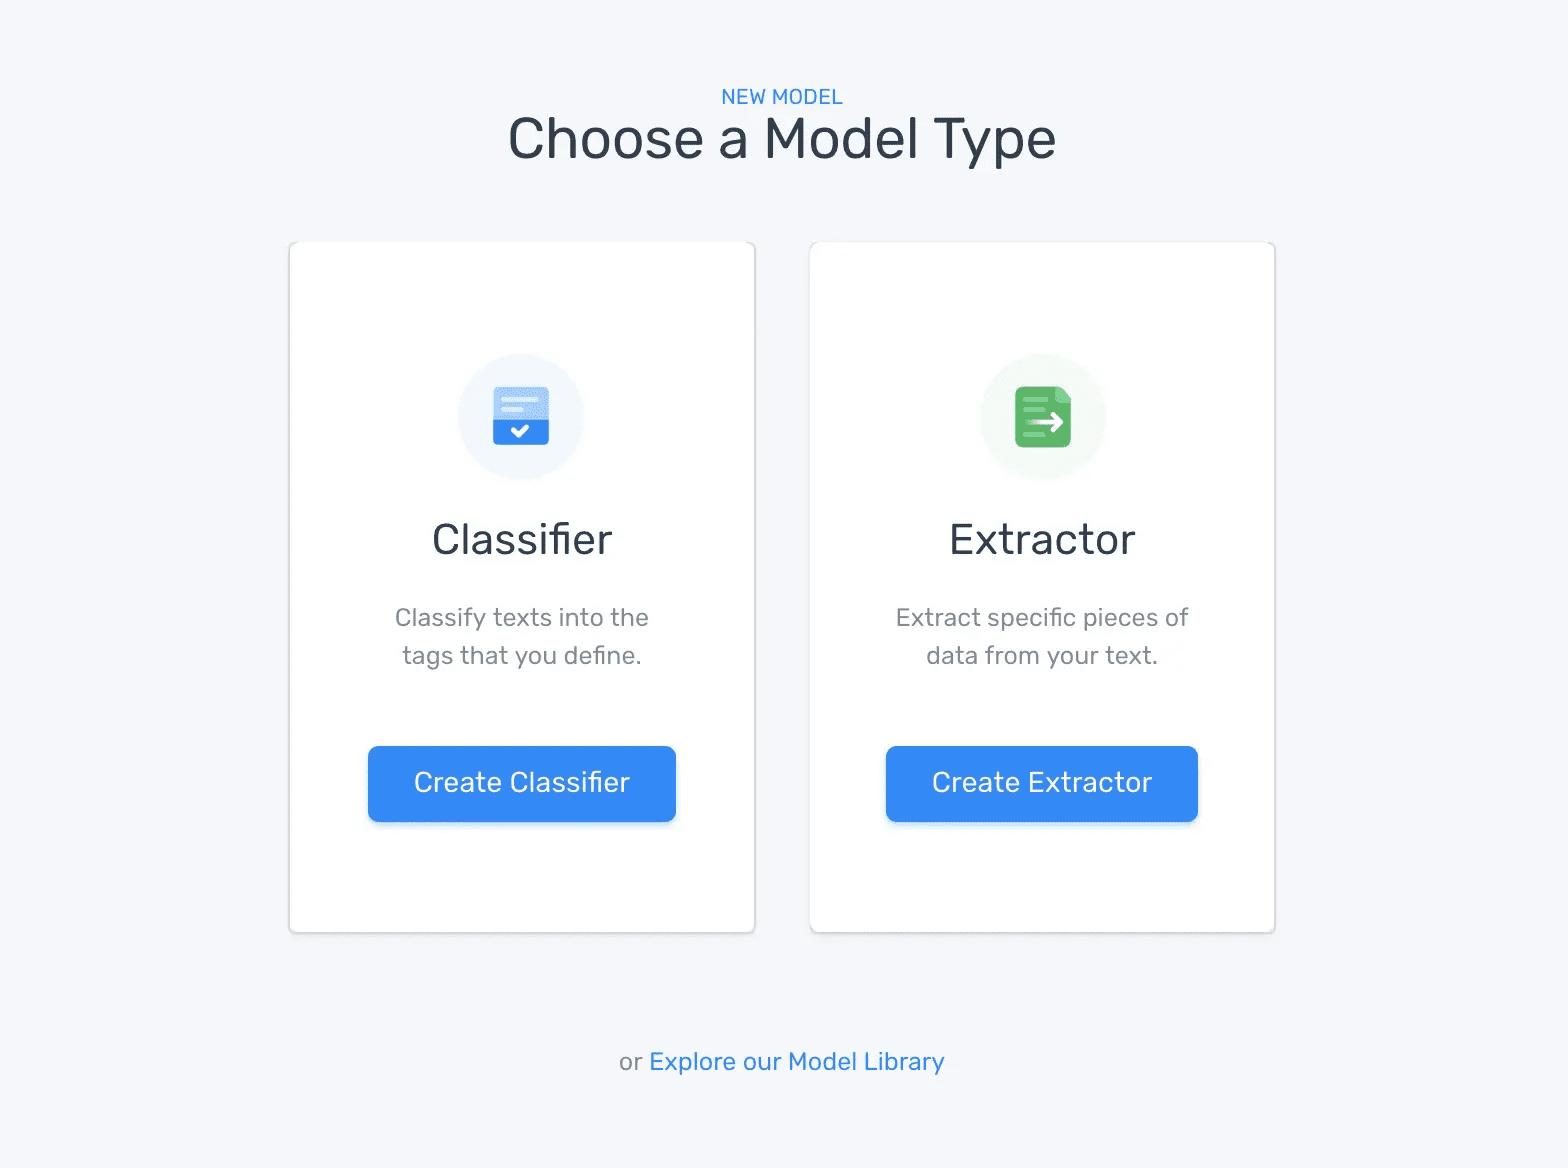 chose a model type